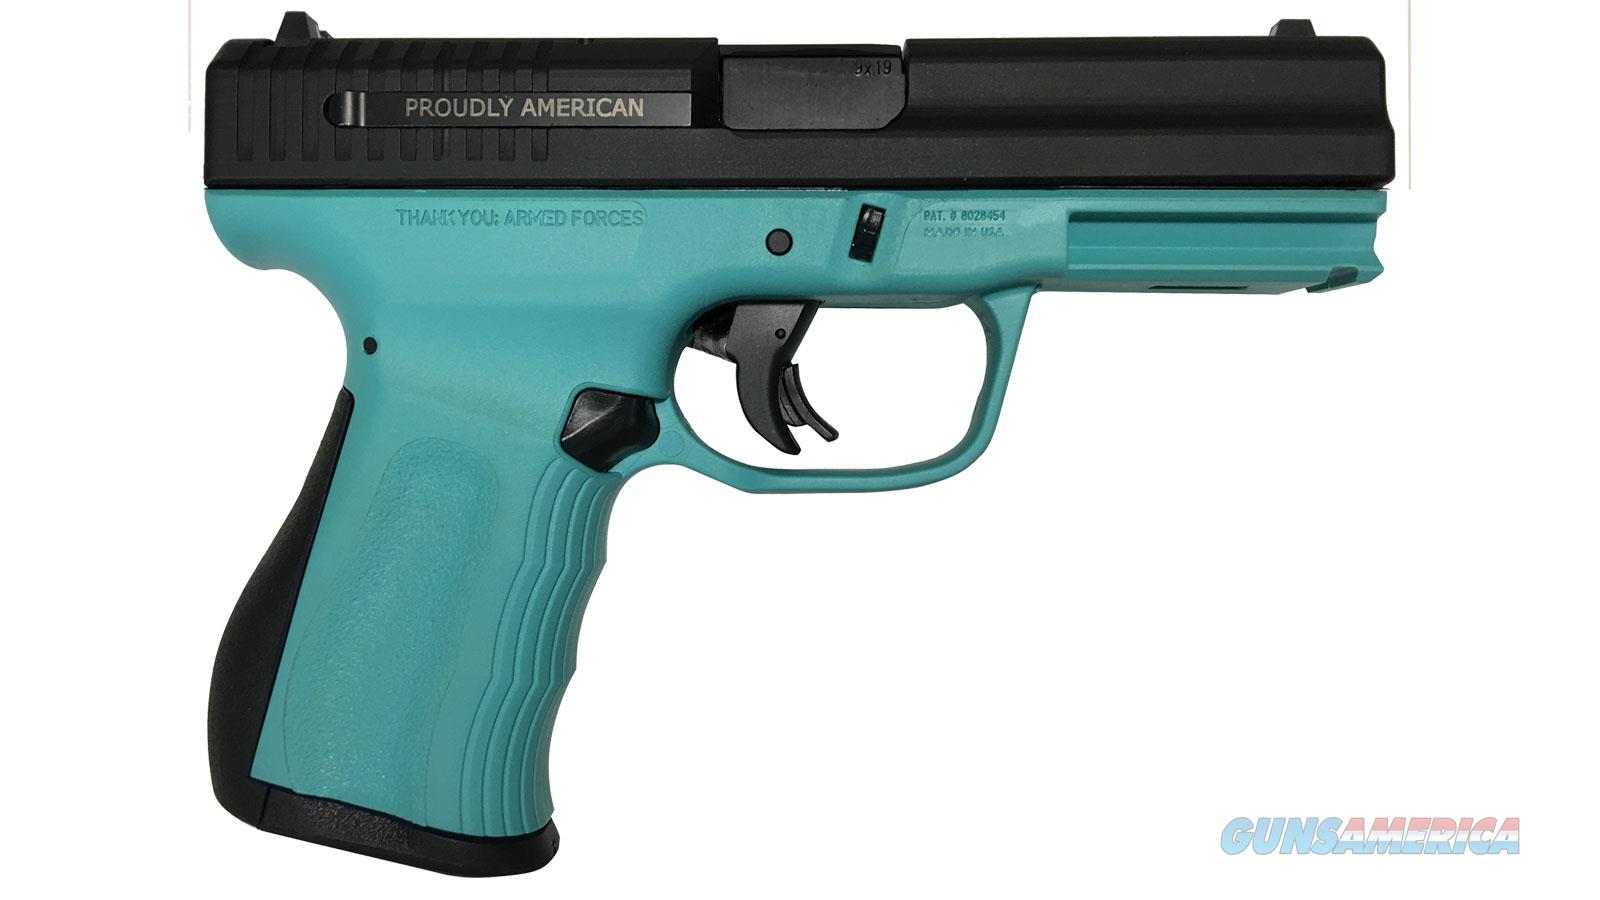 Fmk Firearms 9C1 G2 Fat 9Mm 4 Nms Robins Egg Blue 14Rd FMKG9C1G2TB  Guns > Pistols > F Misc Pistols